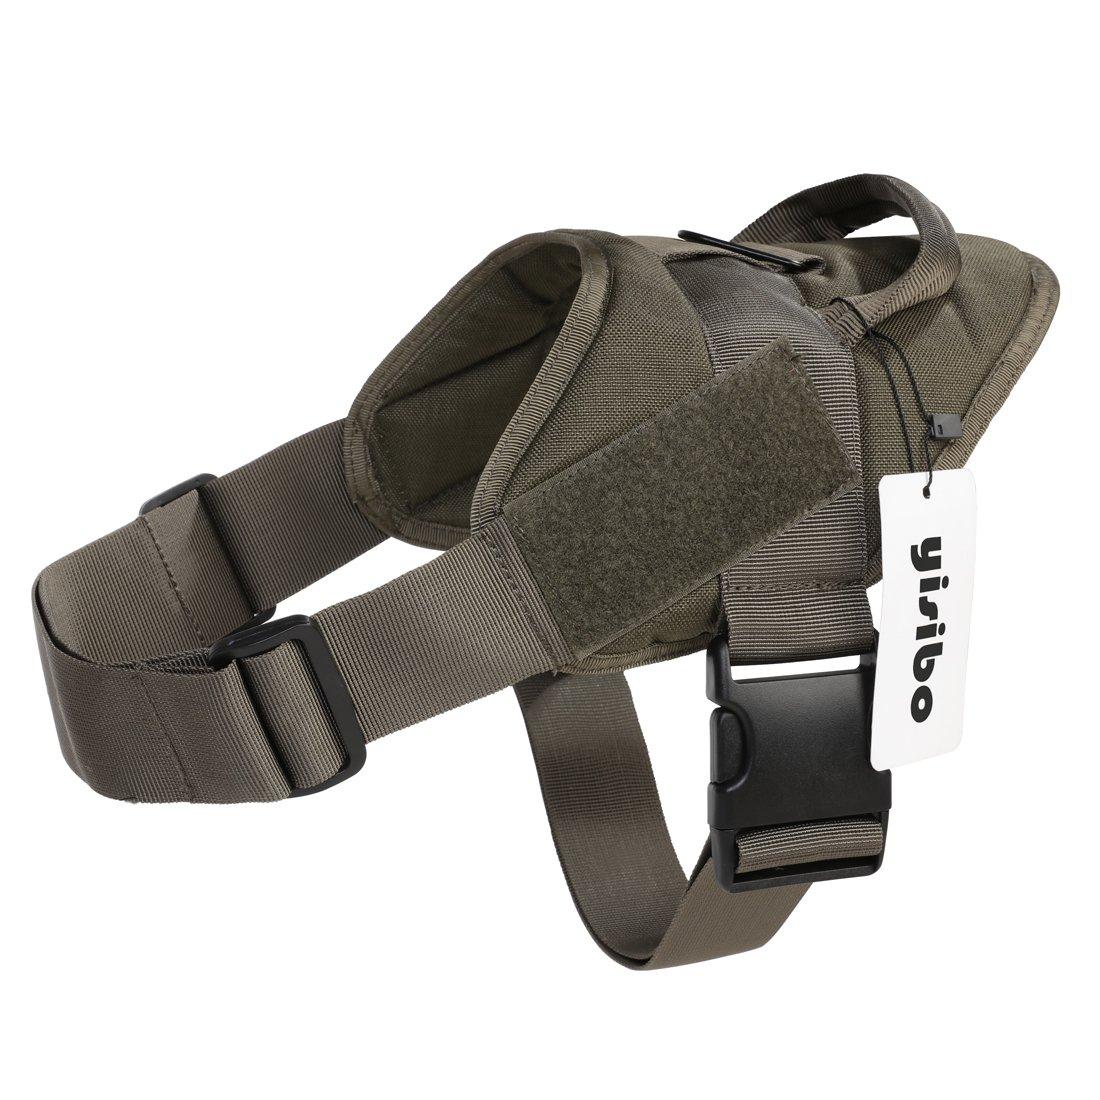 Ranger Green Large(27\ Ranger Green Large(27\ Yisibo Tactical K9 Dog Training Vest Nylon Adjustable Service Police Patrol Molle Harness W  Dog Vest Packs Velcro Vest for Largr Small Dog Pet (L, Ranger Green)